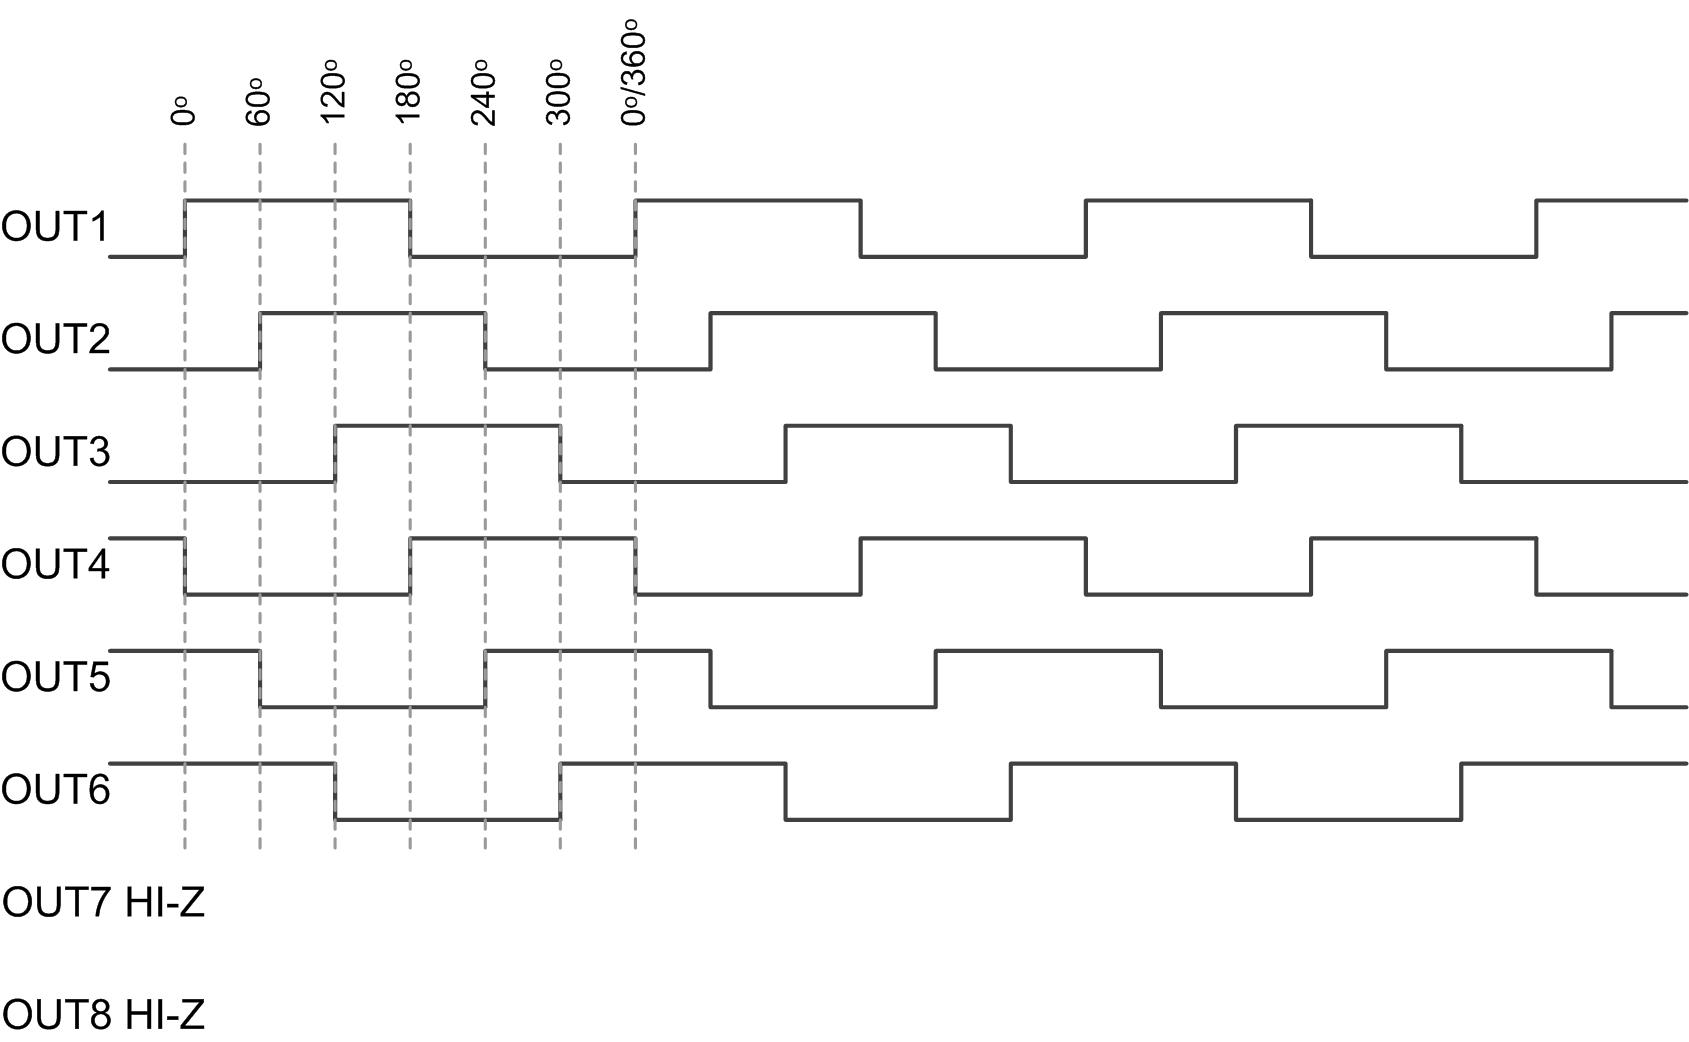 NetFPGA SUME Reference Manual [Reference.Digilentinc]